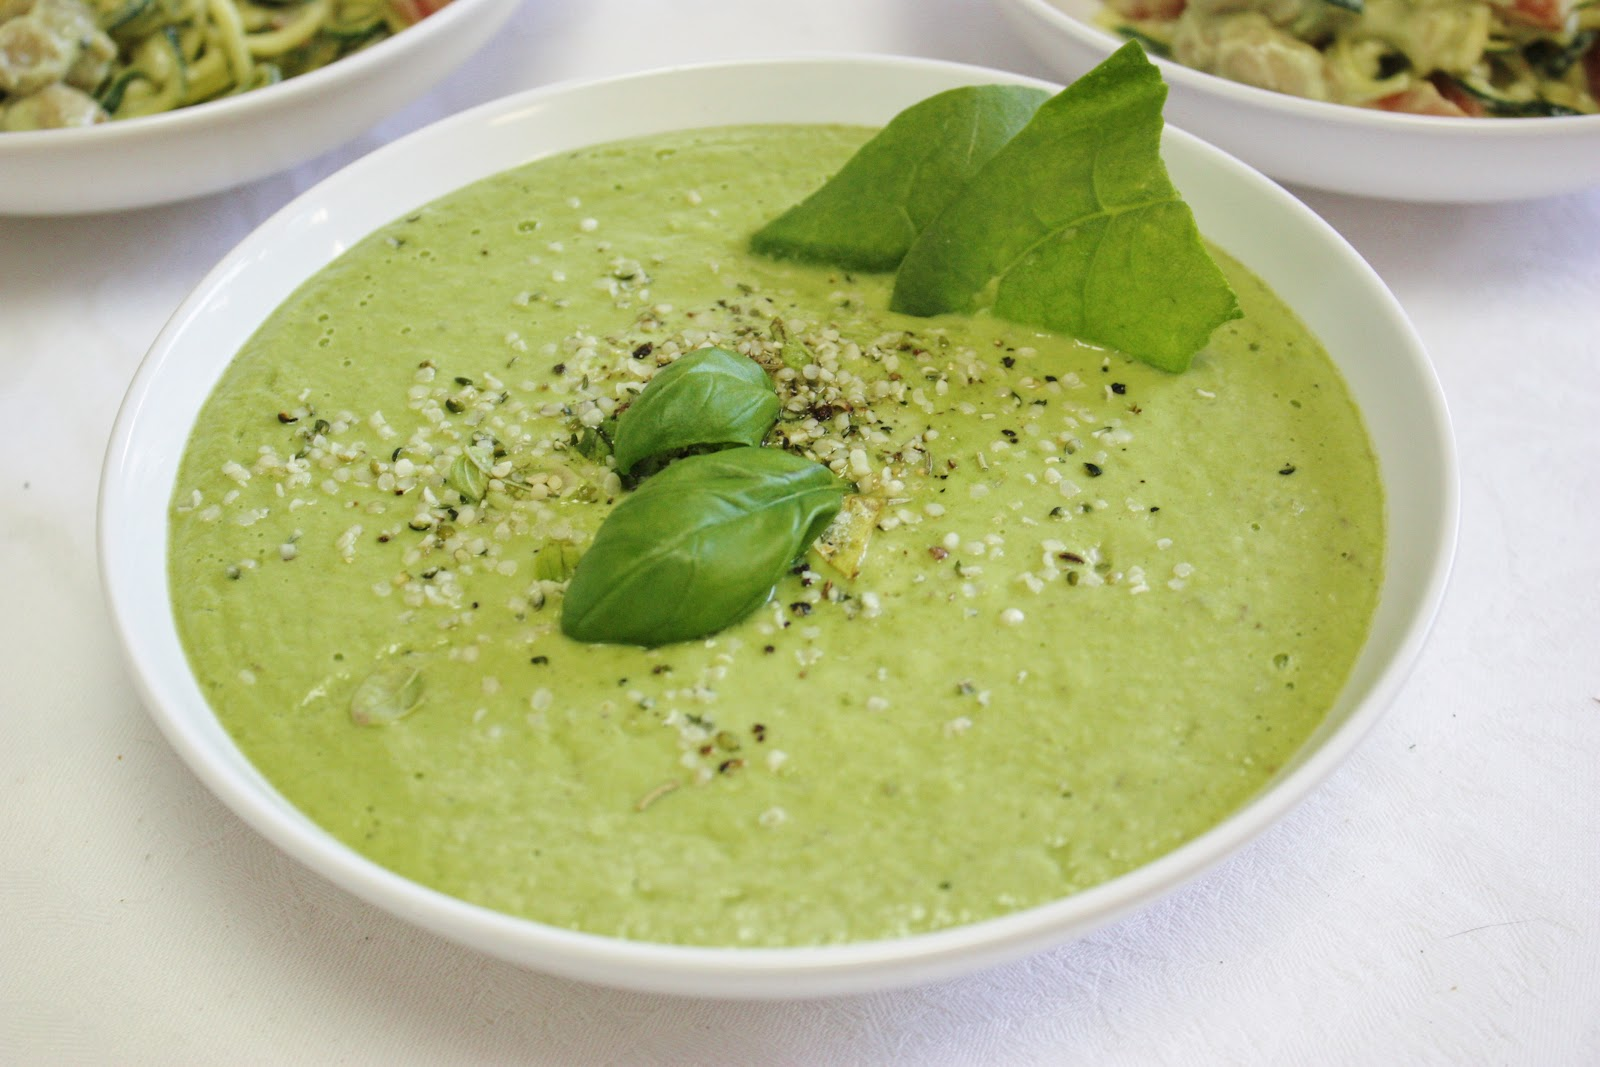 This Rawsome Vegan Life: creamy zucchini pasta & avocado soup